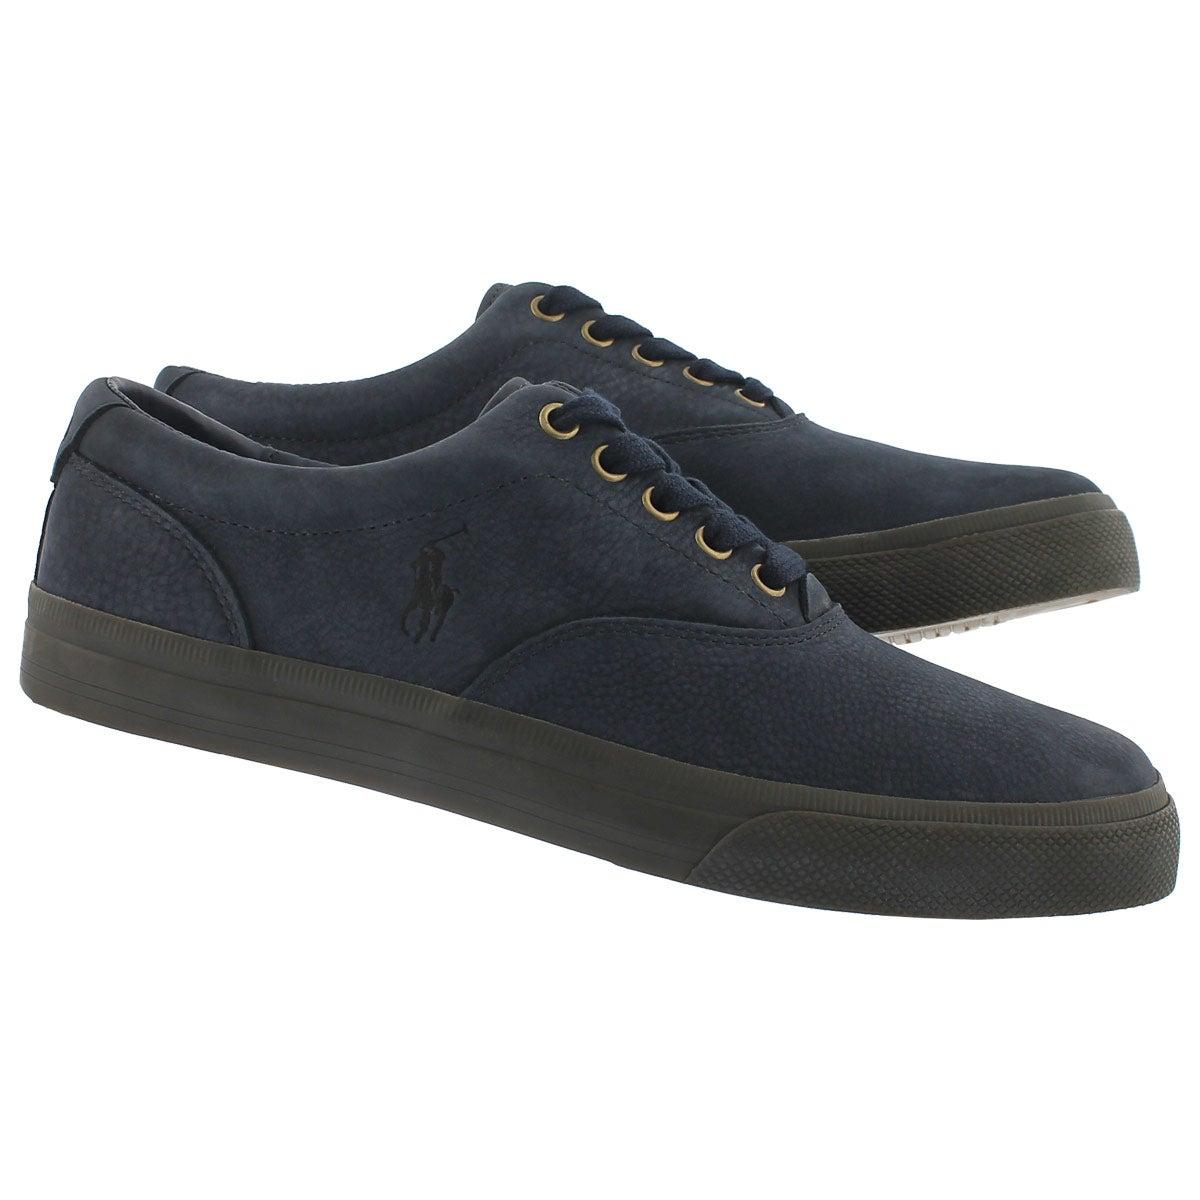 Mns Vaughn newport navy lace up sneaker